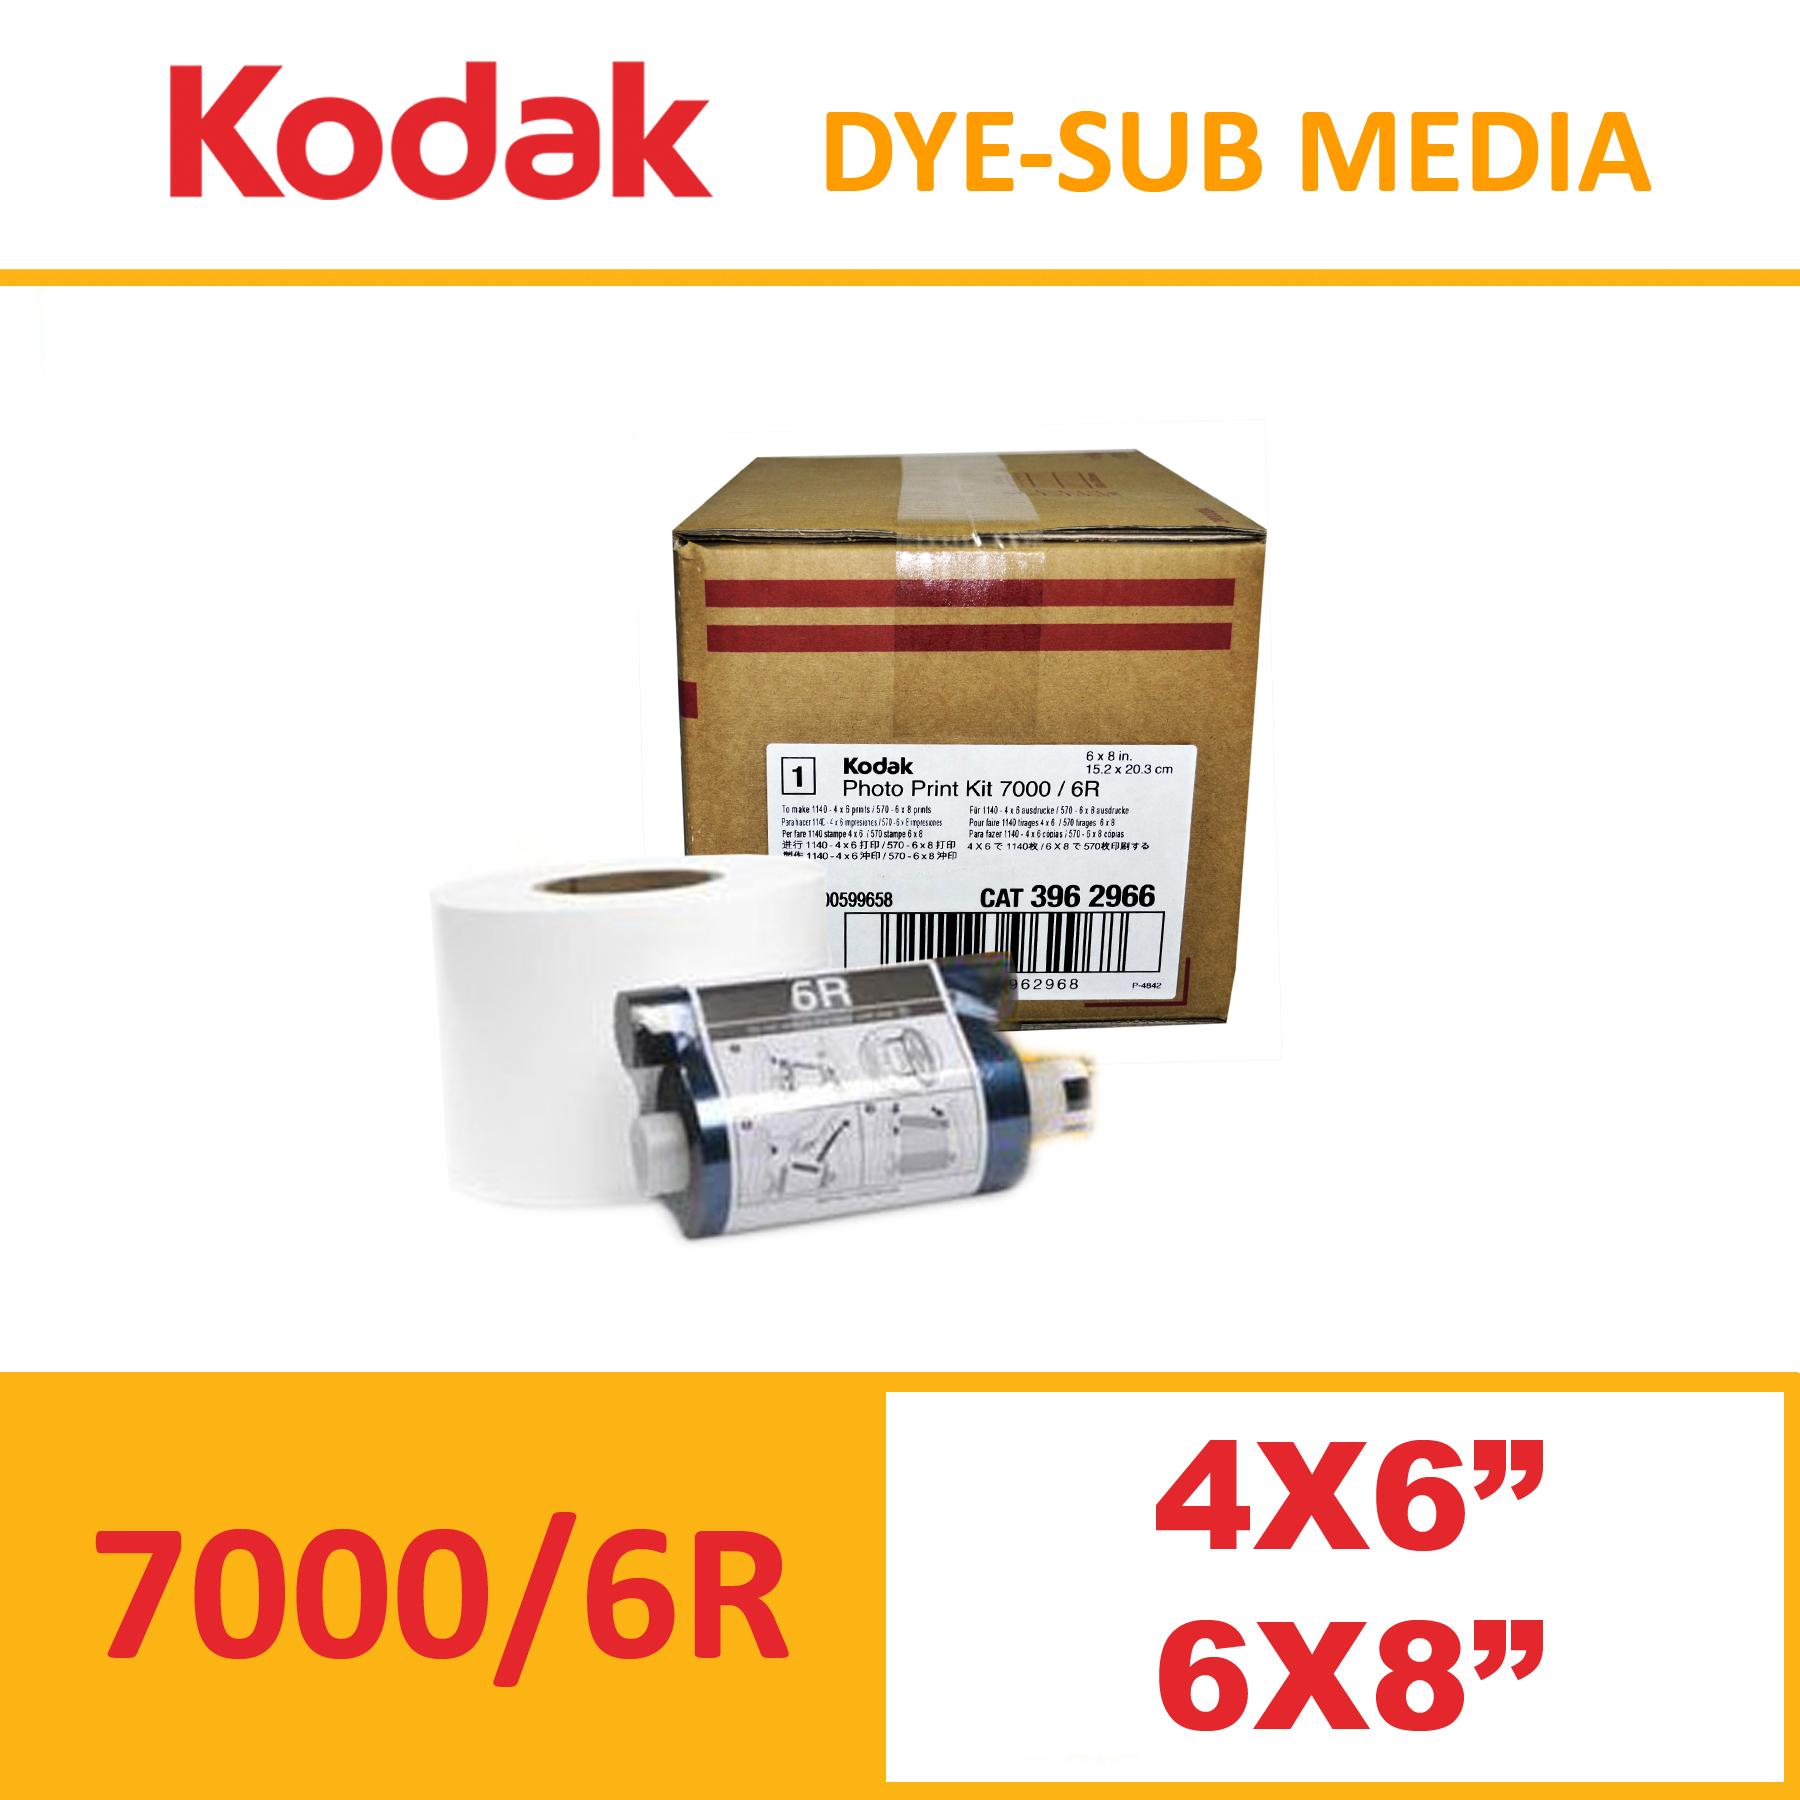 Kodak 7000 Dye-Sub Photo Printer Media Kit